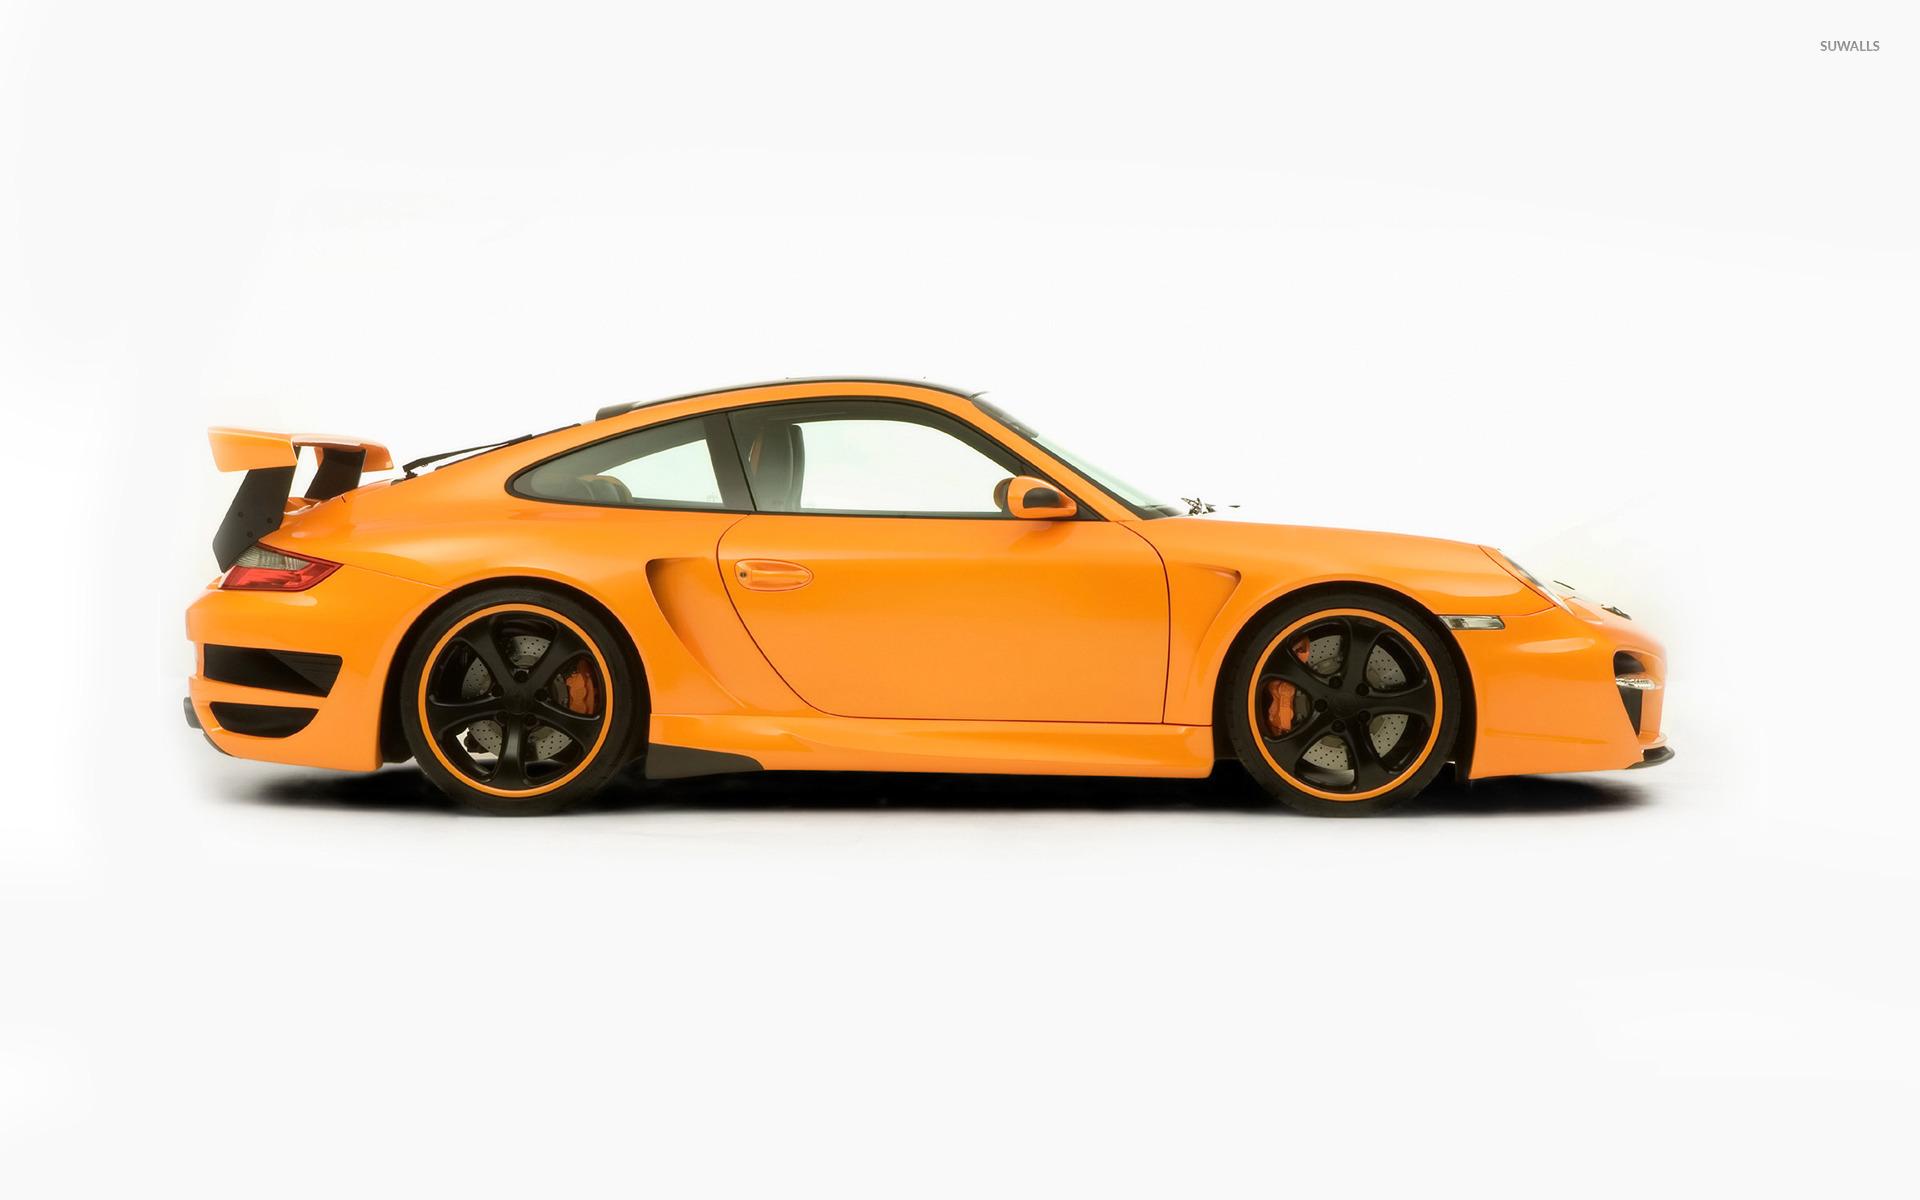 TechArt Porsche Turbo